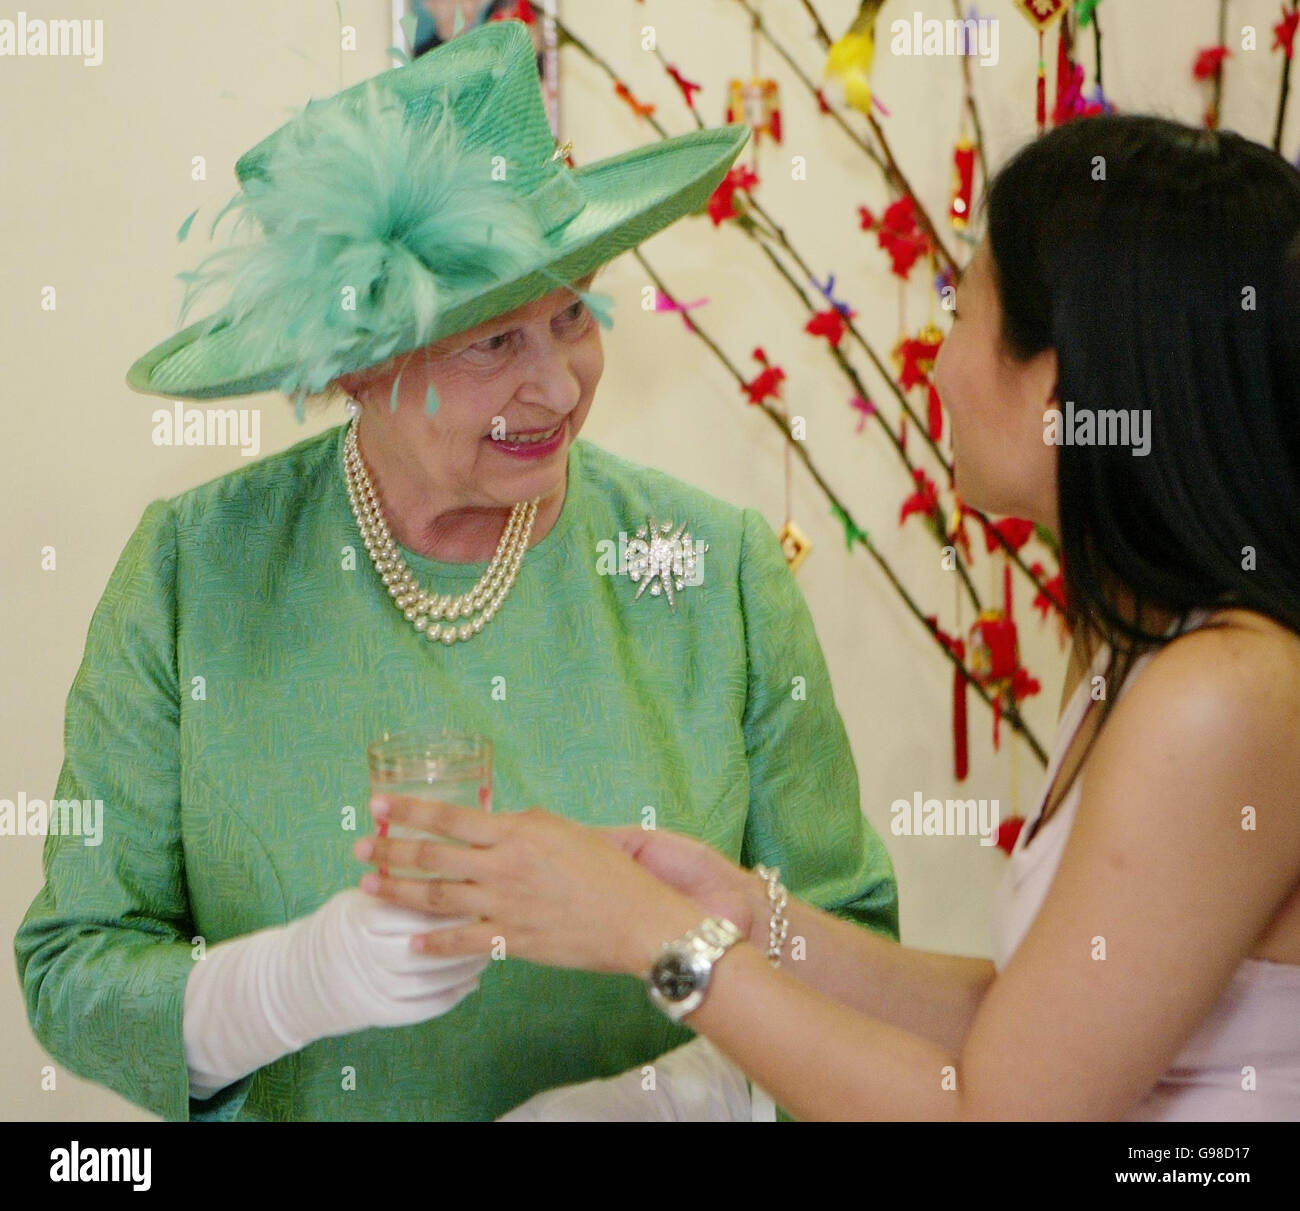 Royalty - Queen Elizabeth II Visit to Singapore - Stock Image